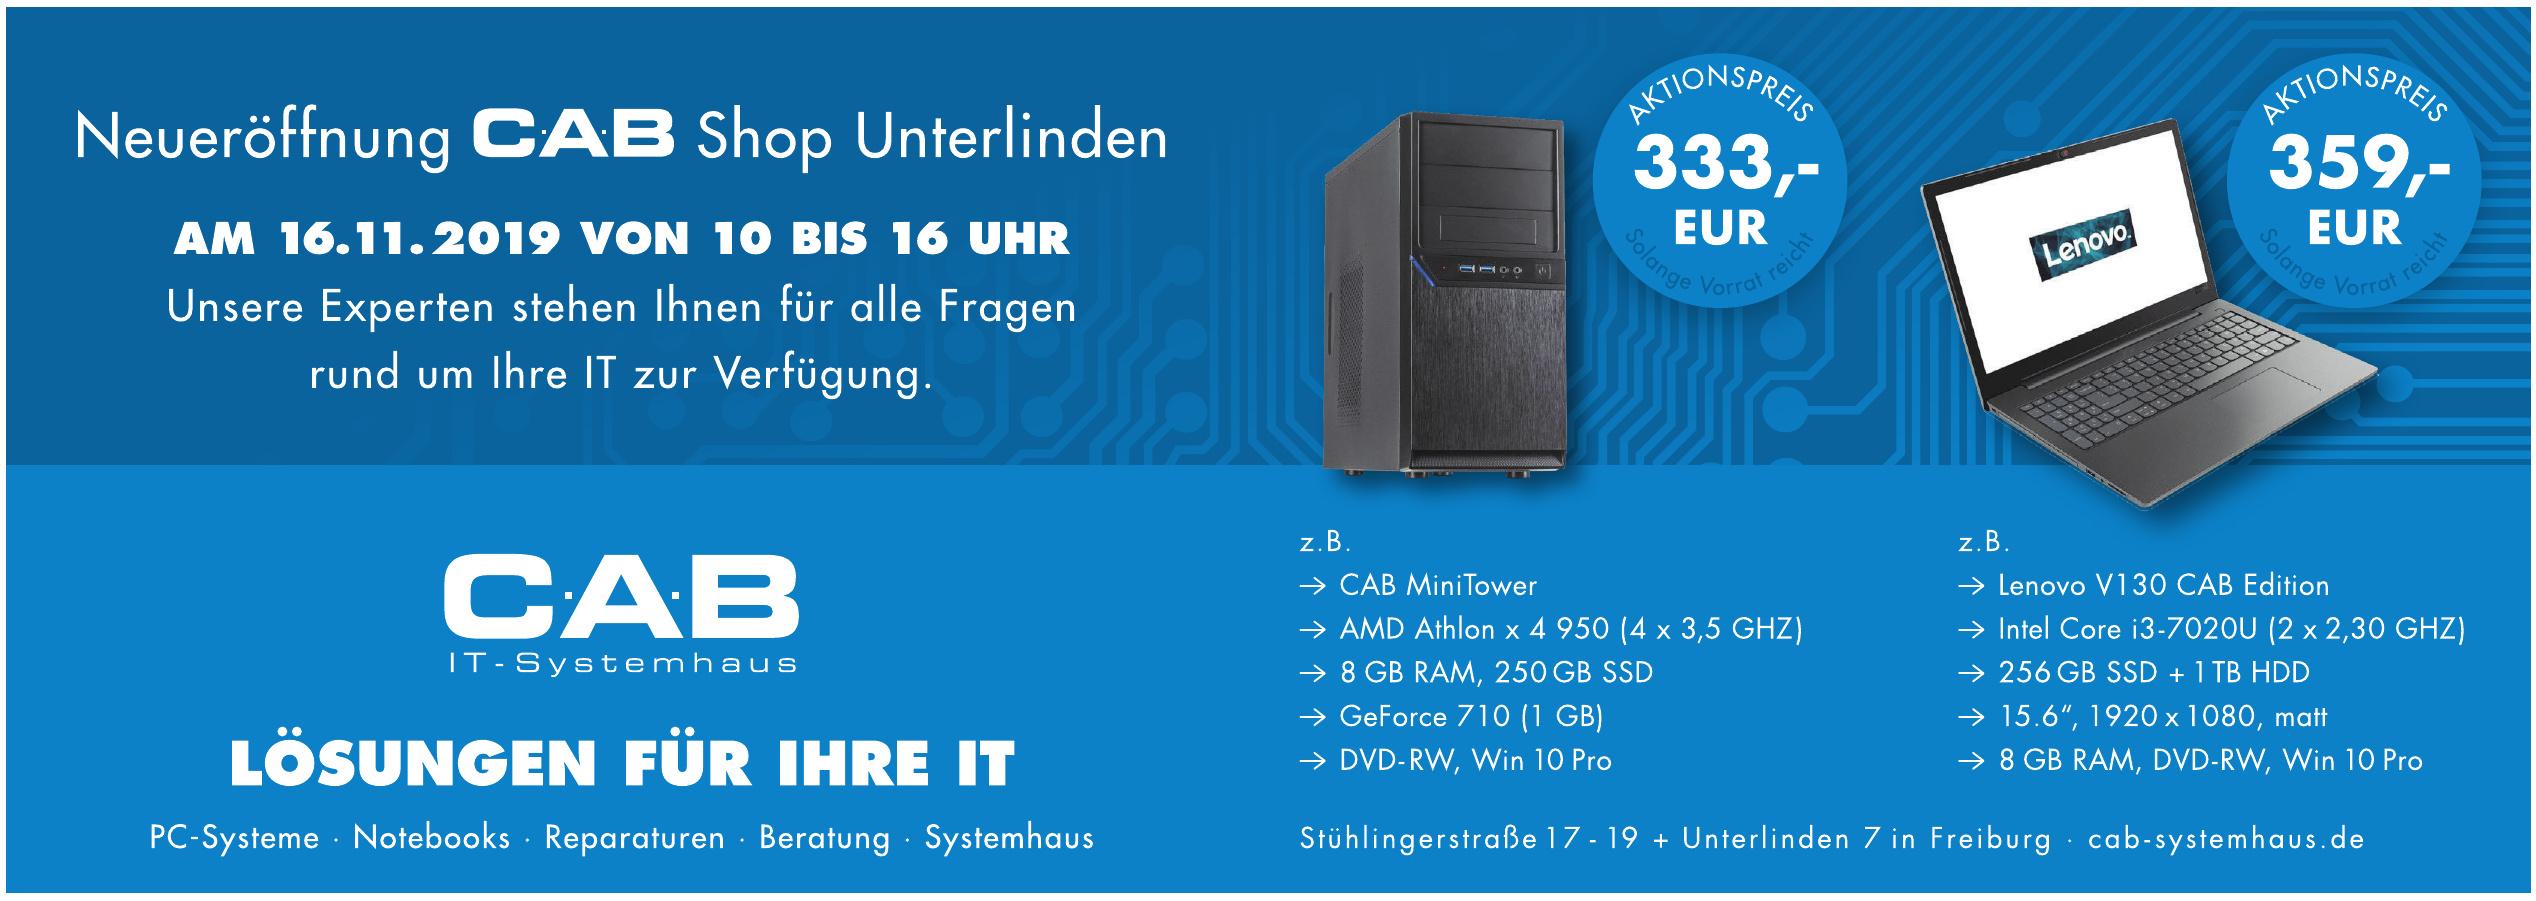 CAB-IT-Systemhaus GmbH